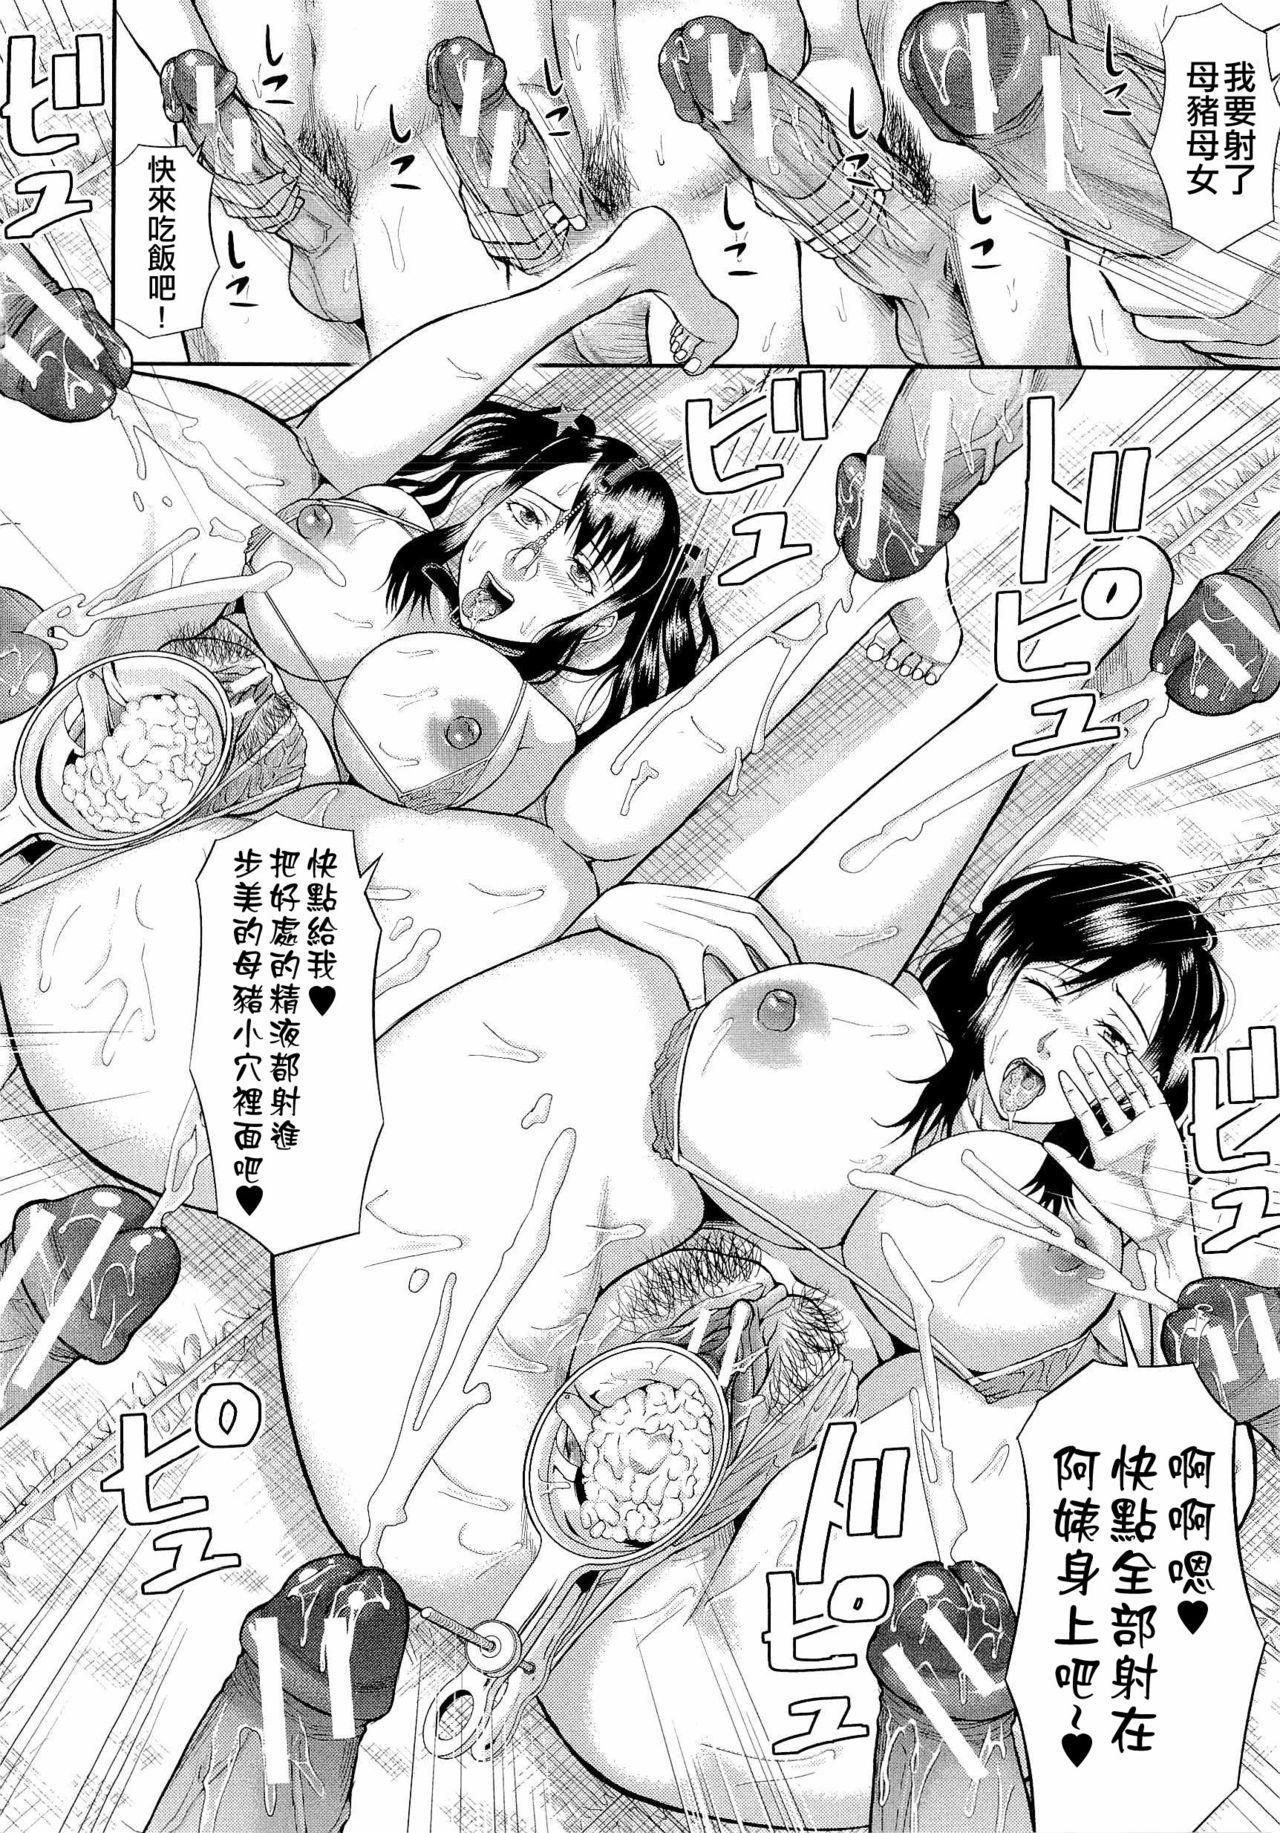 [Honebuto Danshaku] Innou Kaizou Program ~Oyako Zecchou Cult Ochi~ [Chinese]【不想记名重嵌--高质量图源】 158